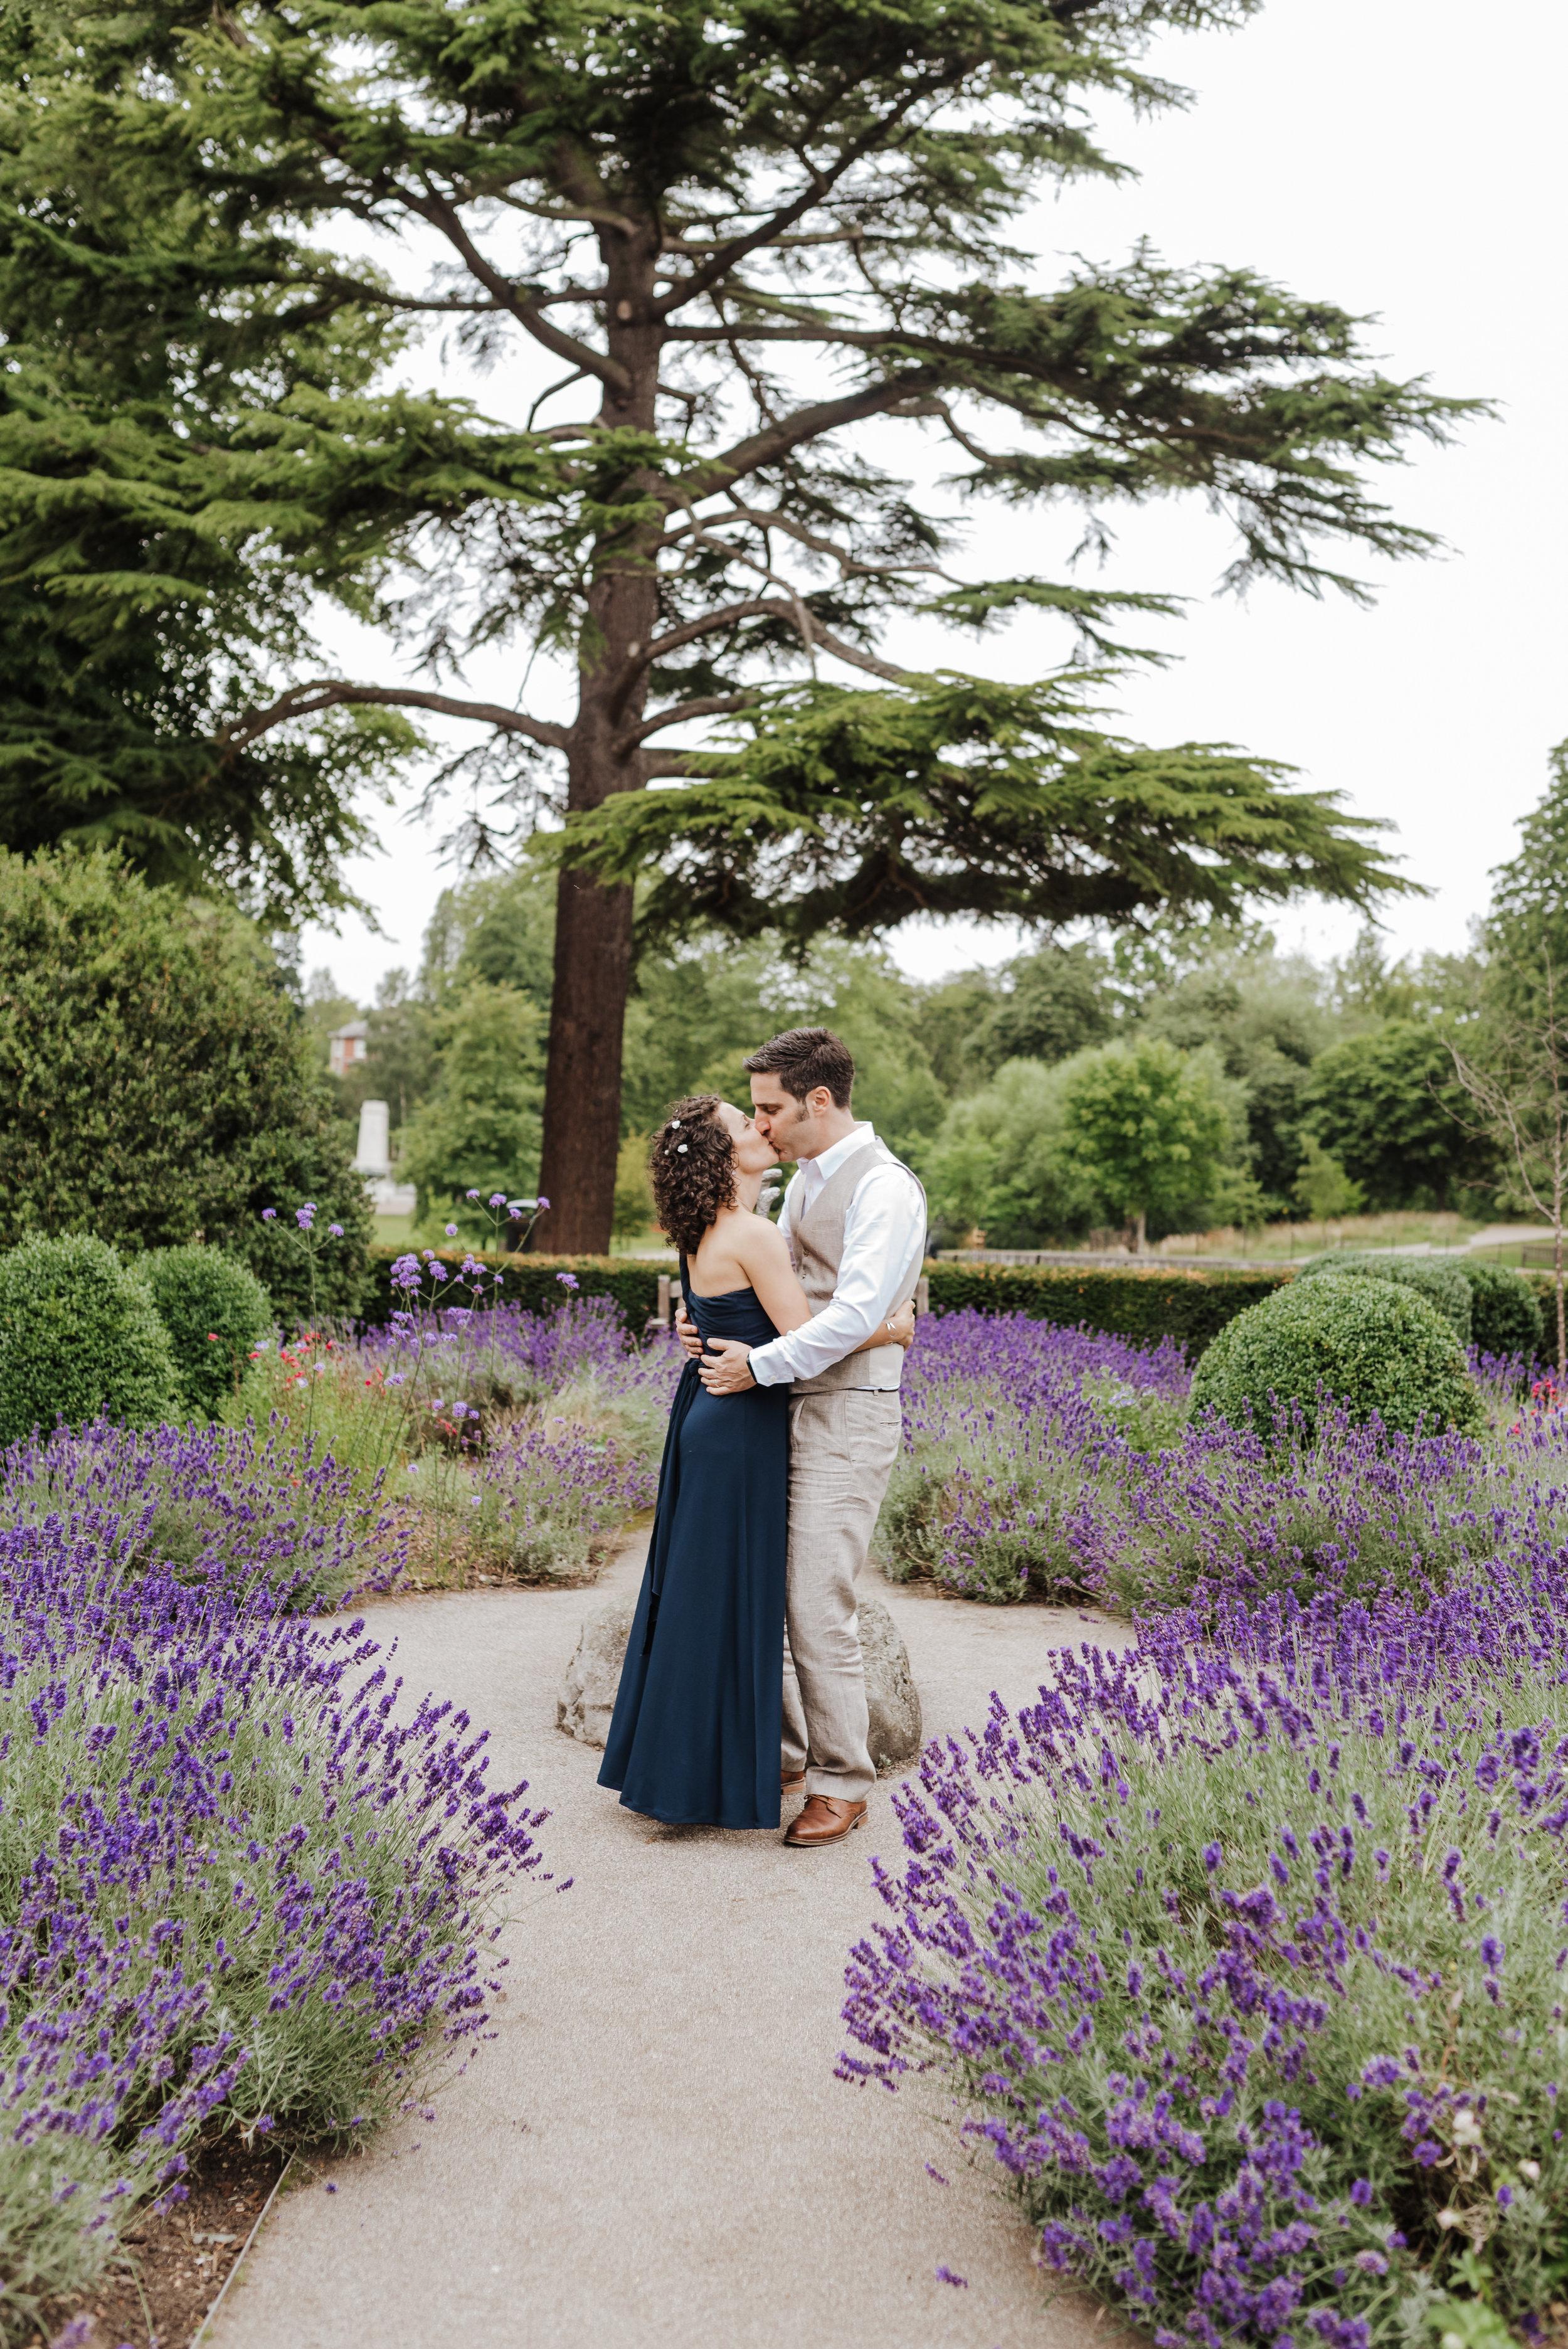 Konjo-Photography-Essex-Suffolk-Norfolk-Wedding-Photographer-And-Videographer-Wedding-Videography (16).jpg